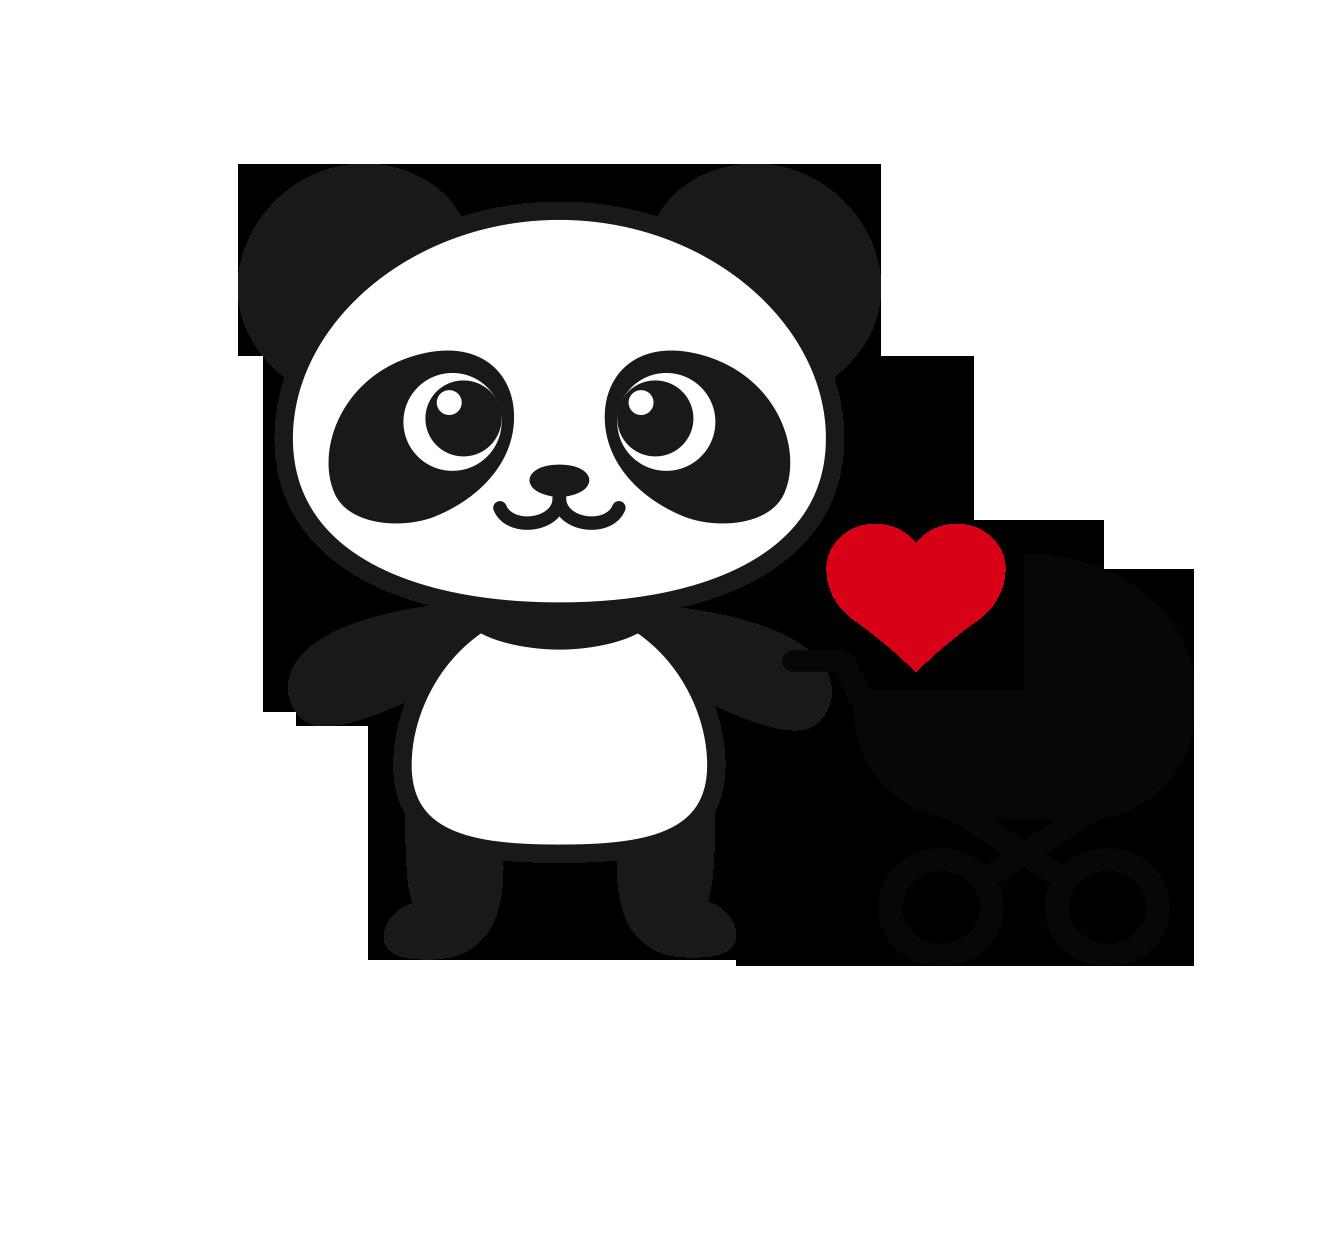 Maid clipart nanny. Blog panda navigation loginregister